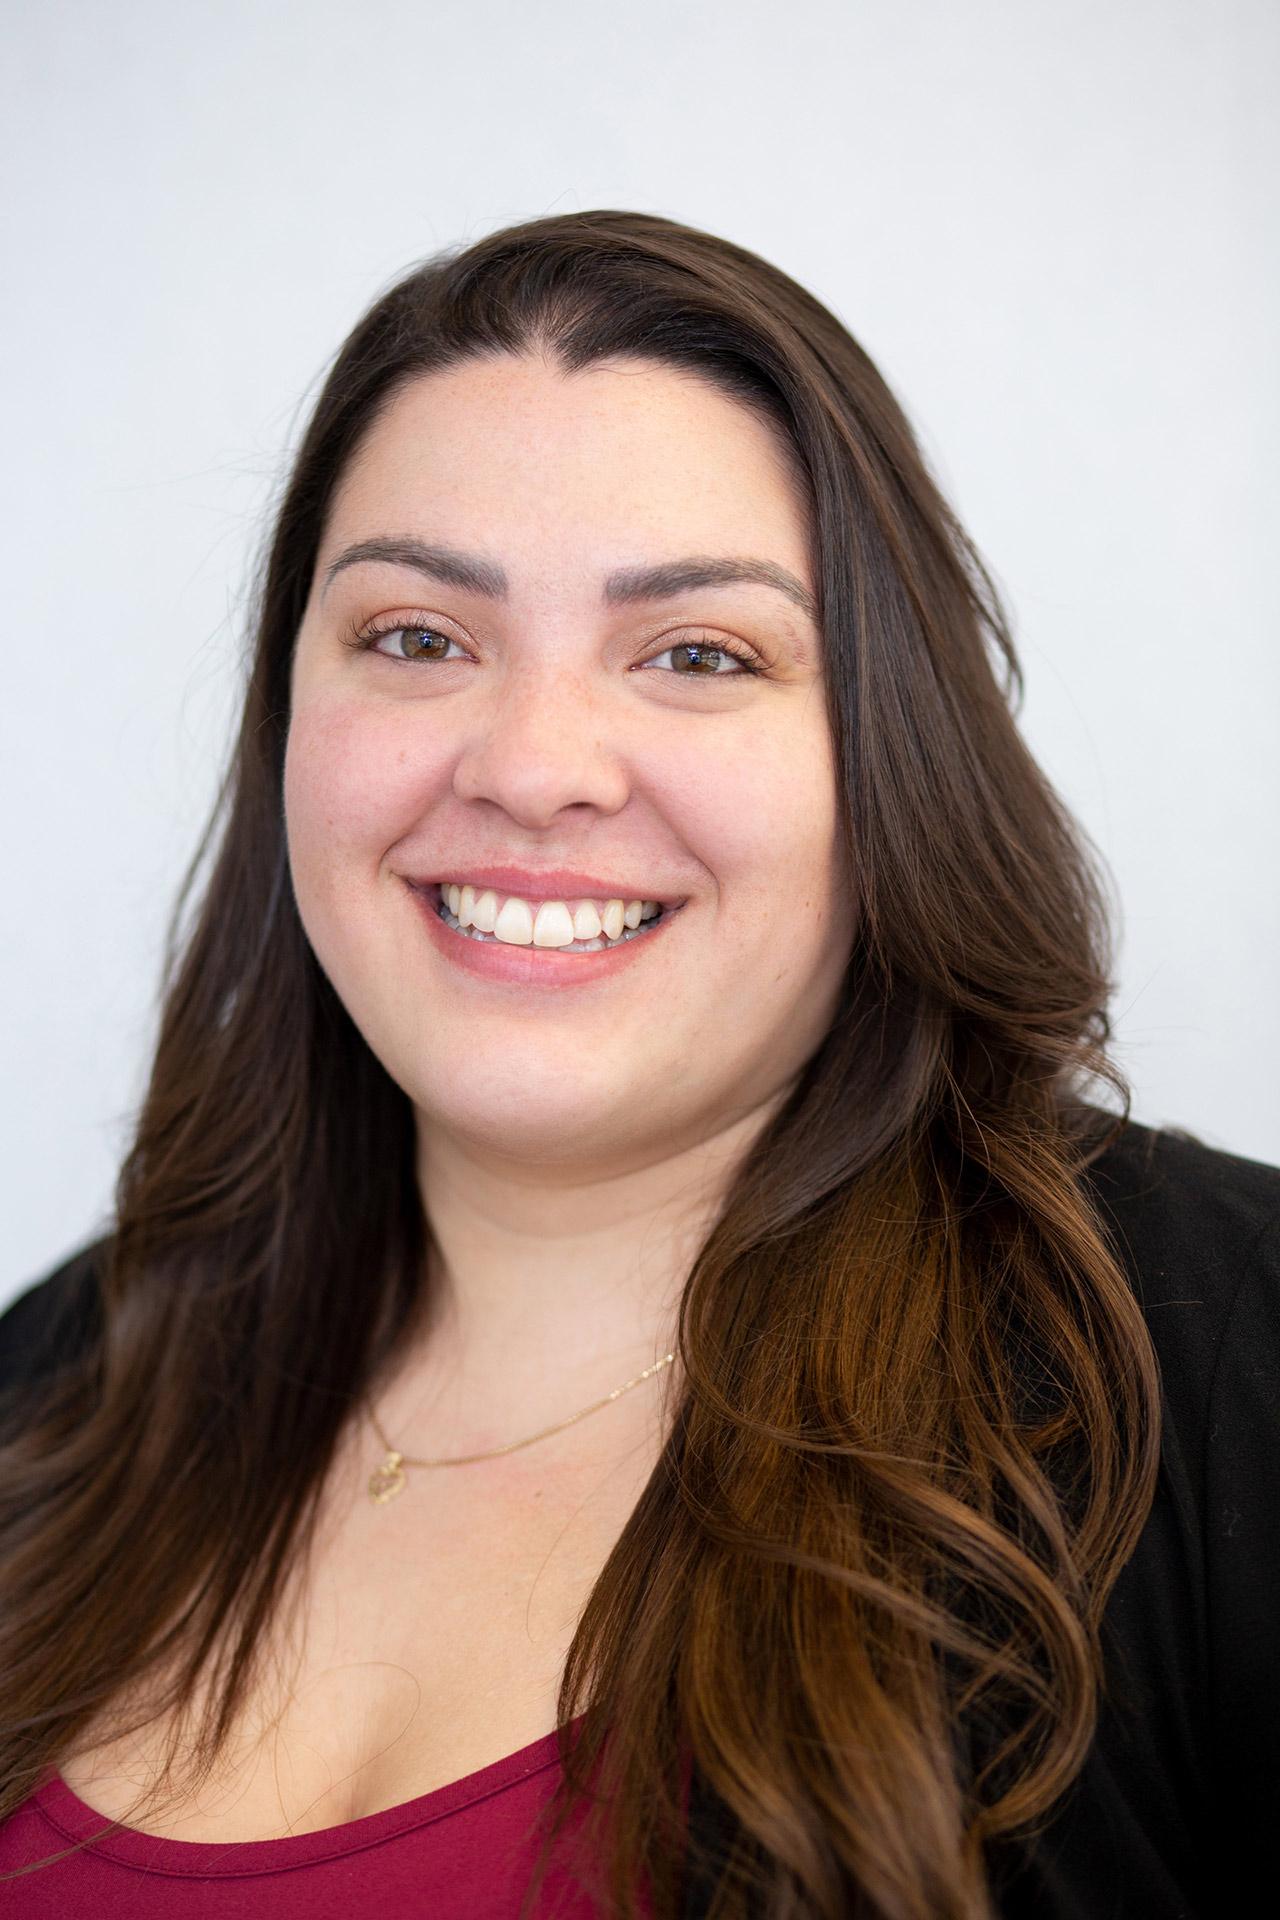 Shayla Jorquera